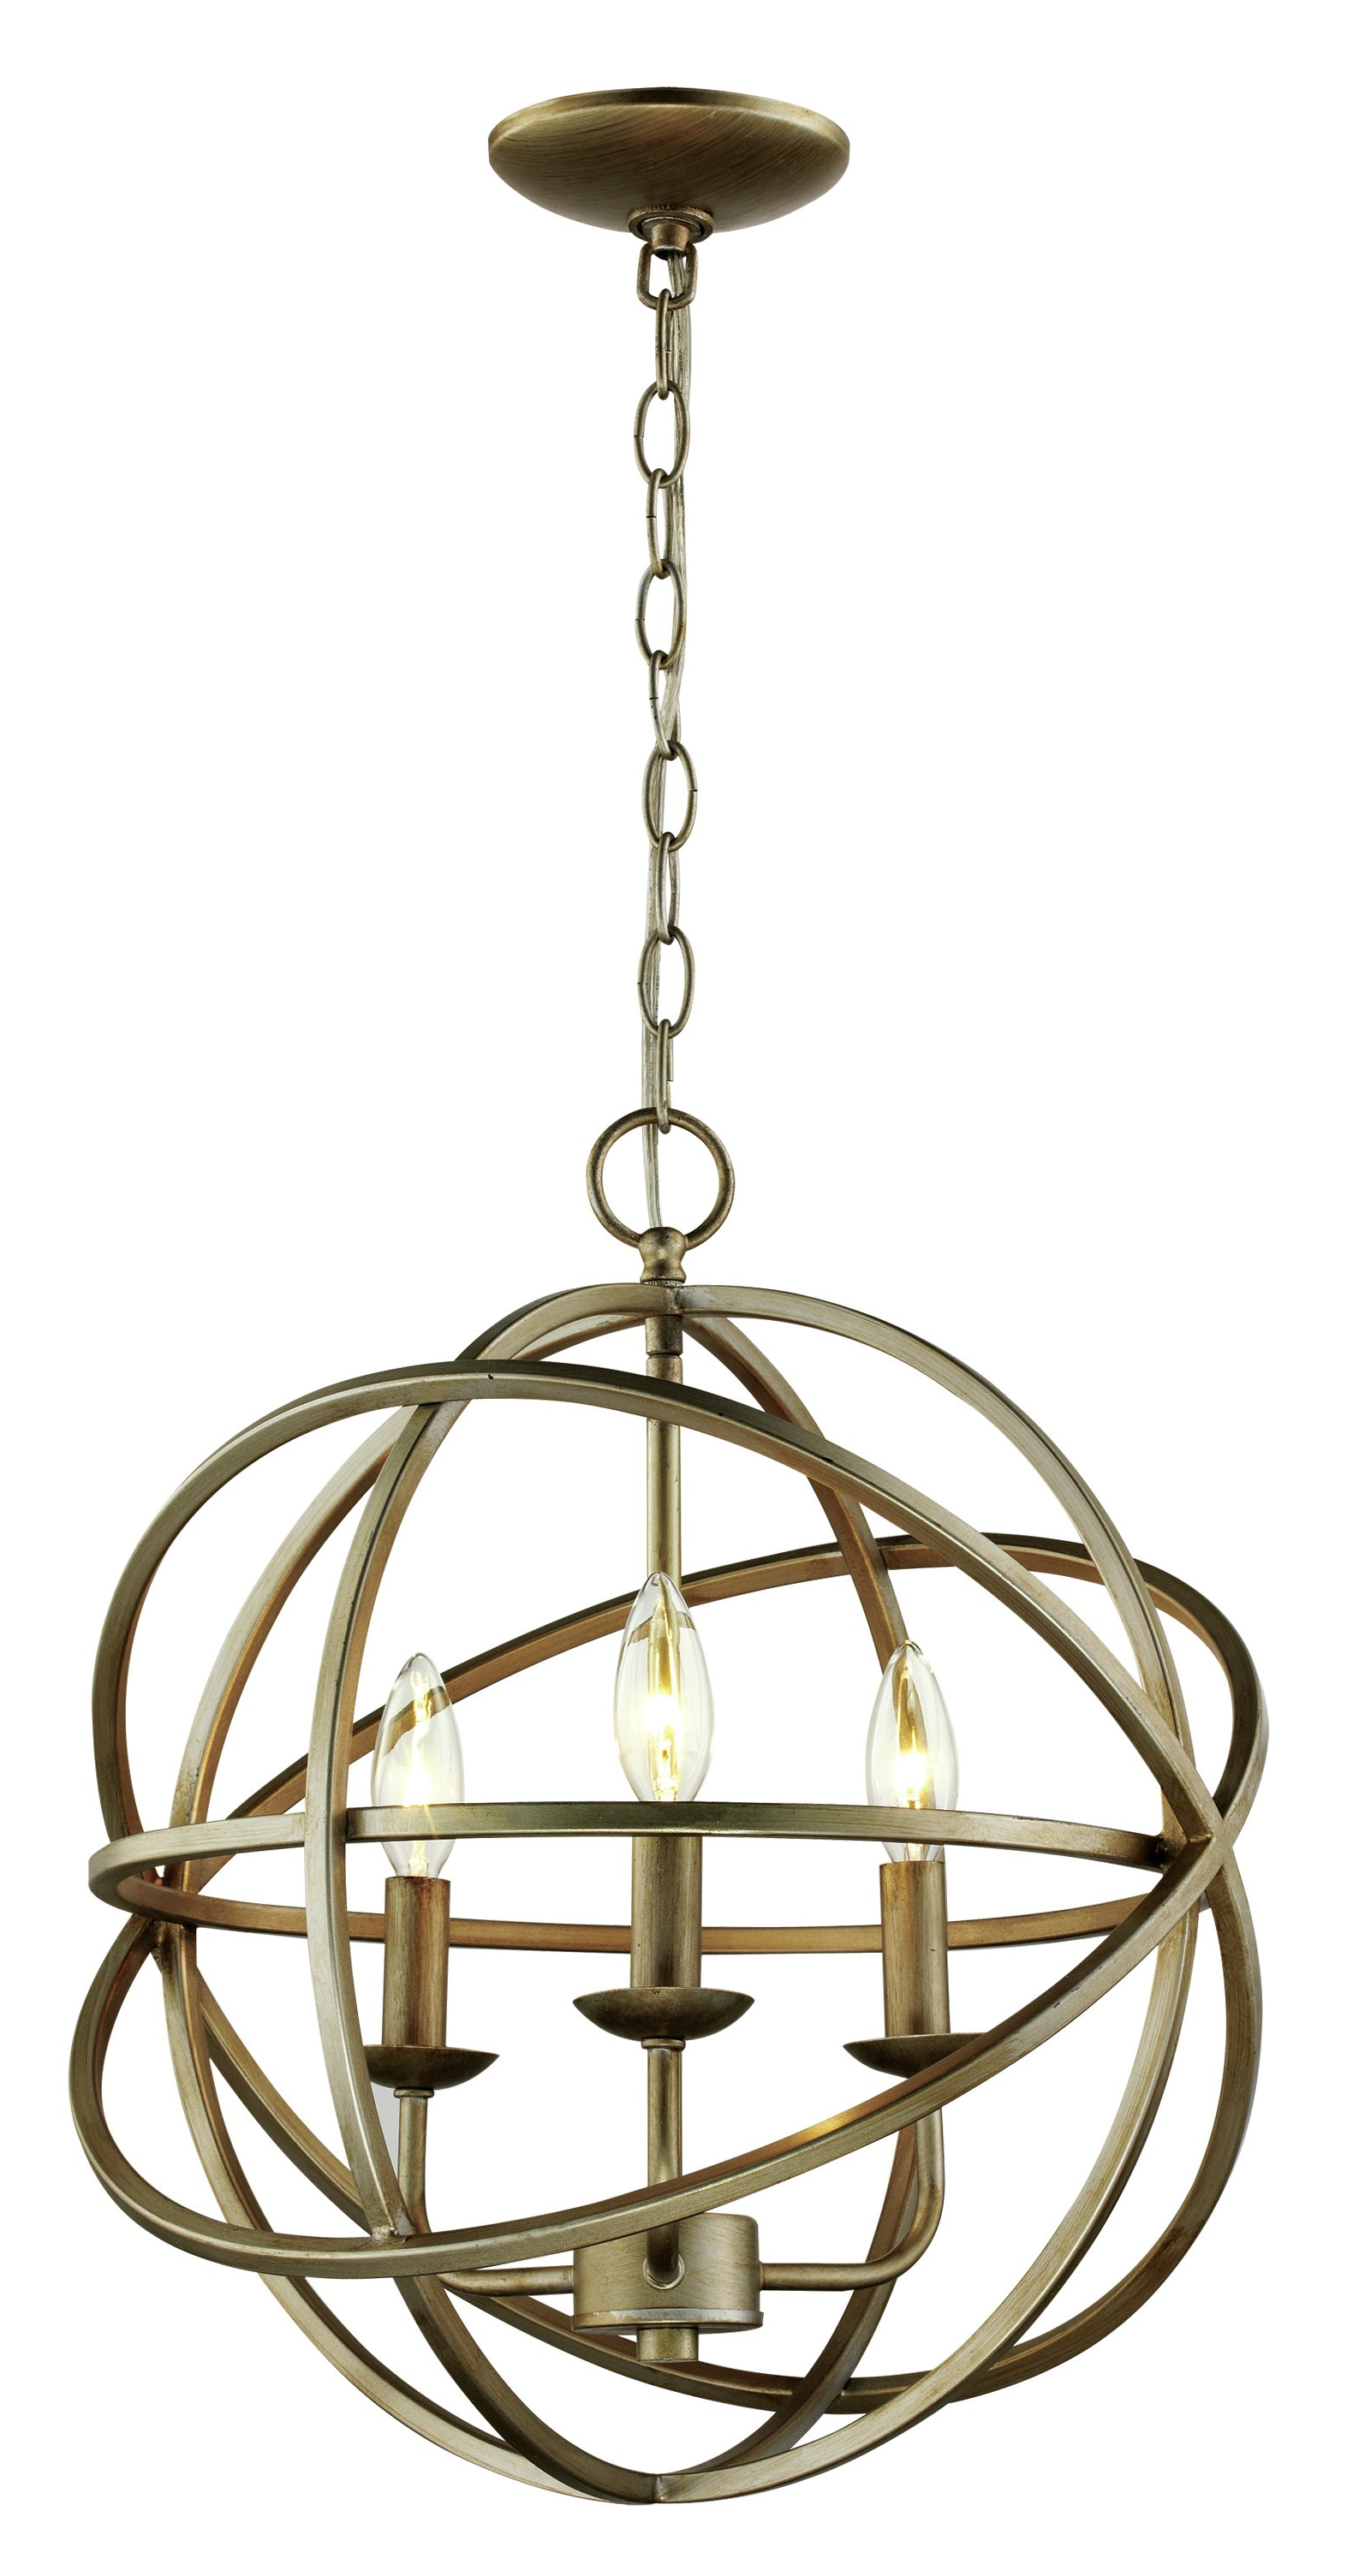 2019 Shipststour 3 Light Globe Chandeliers Regarding Baitz 3 Light Globe Chandelier (Gallery 5 of 20)